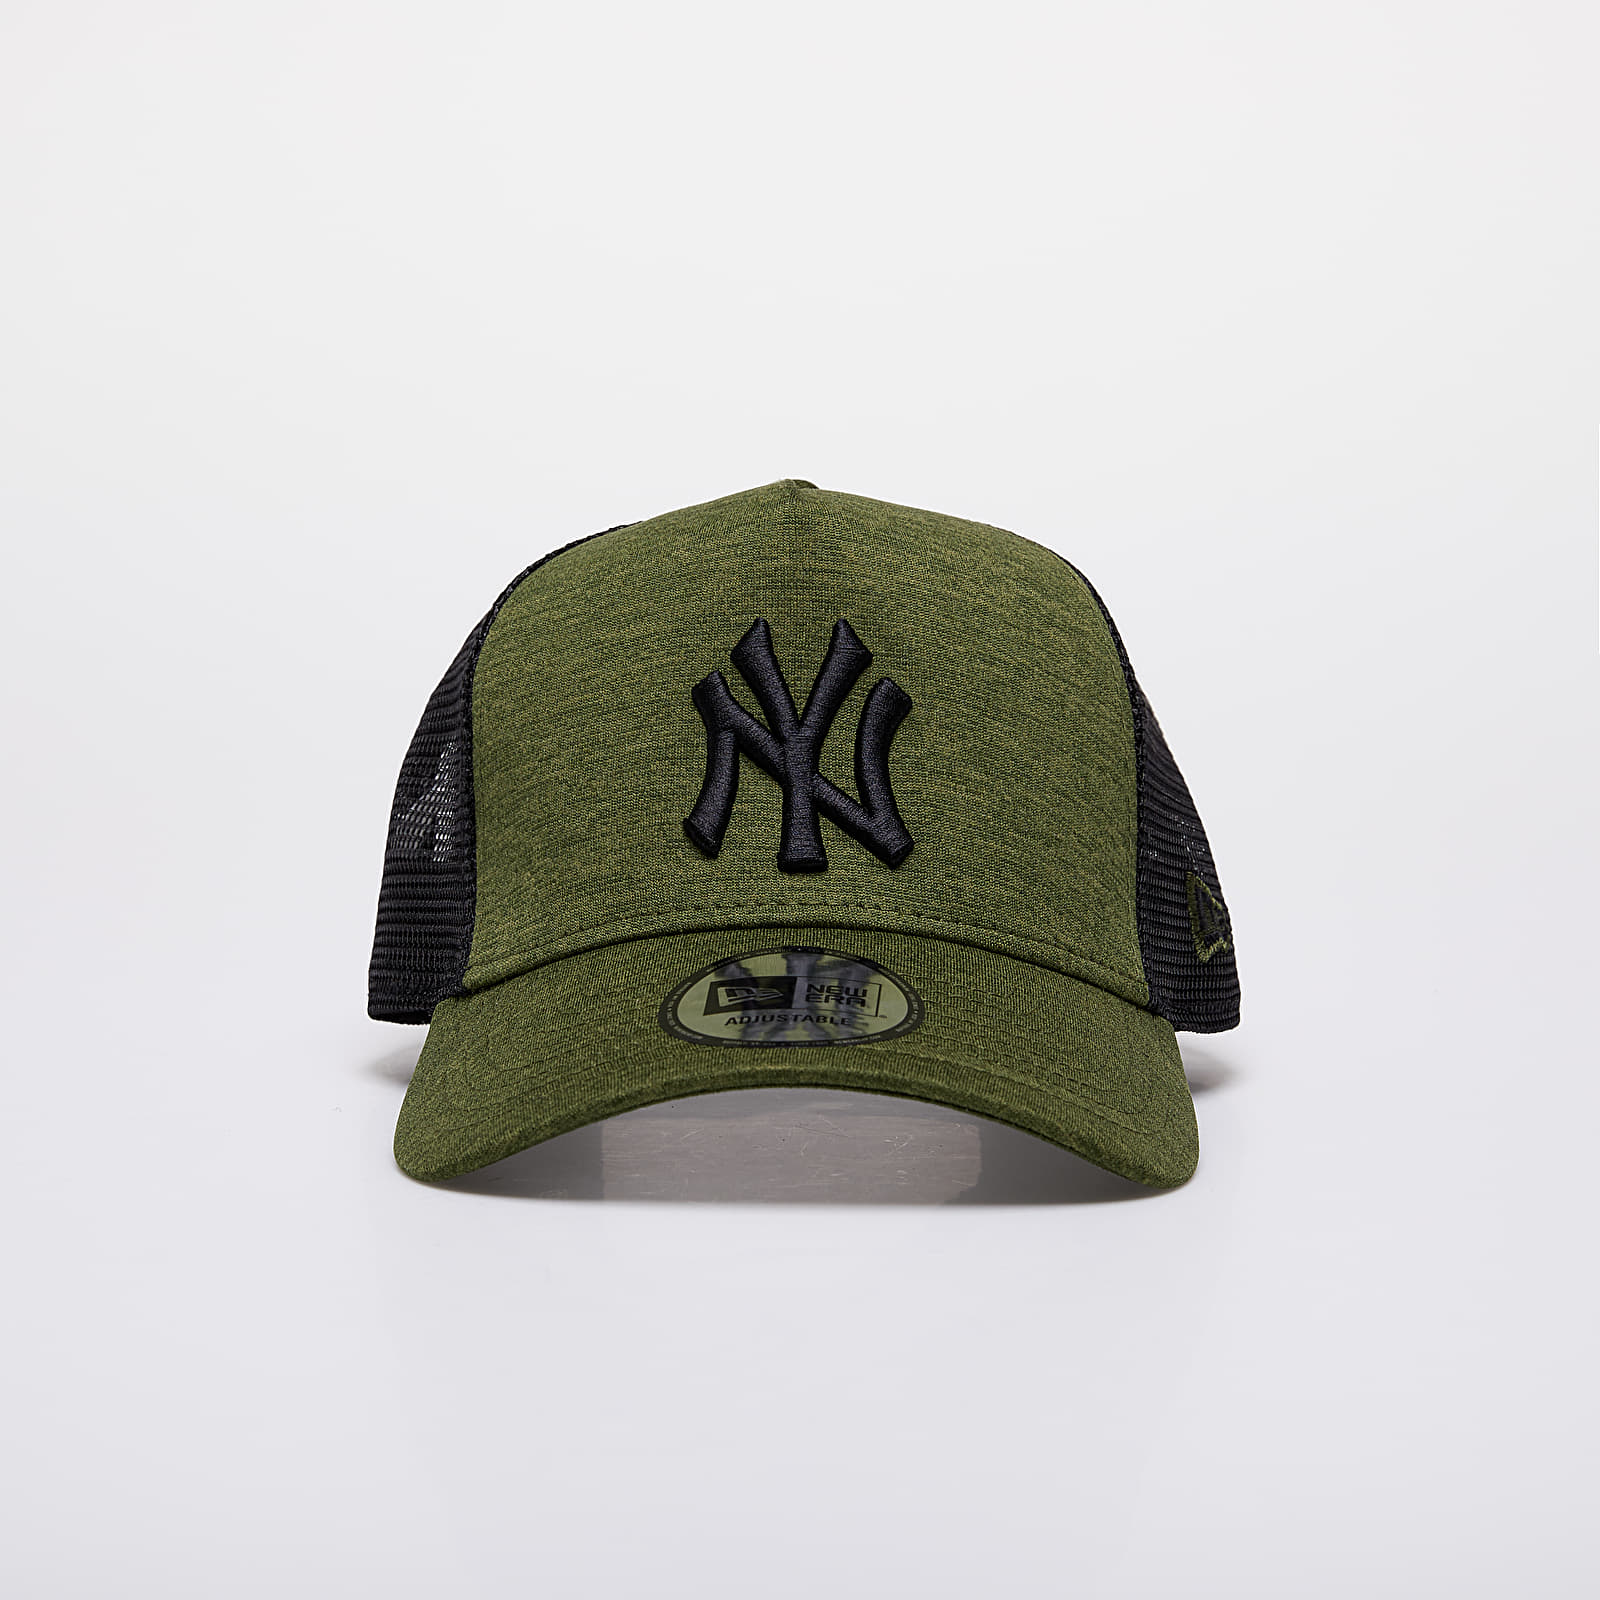 New Era MLB Shadow Tech New York Yankees Trucker